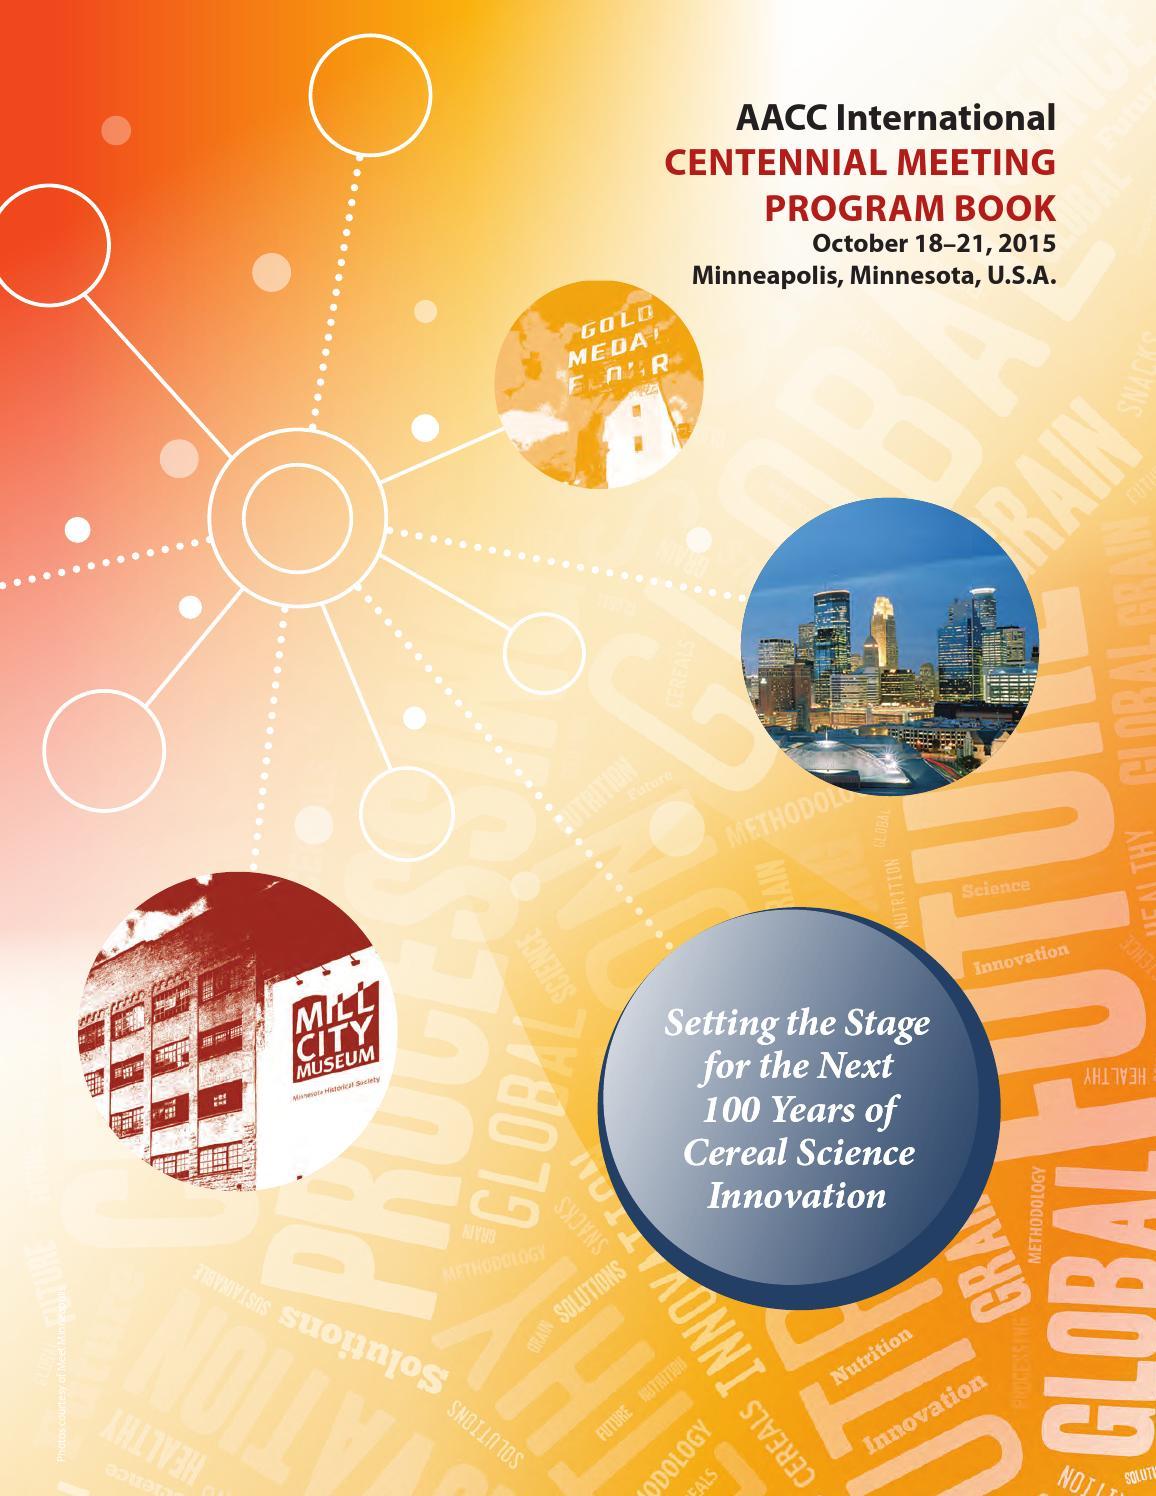 AACCI Centennial Program Book by Scientific Societies - issuu